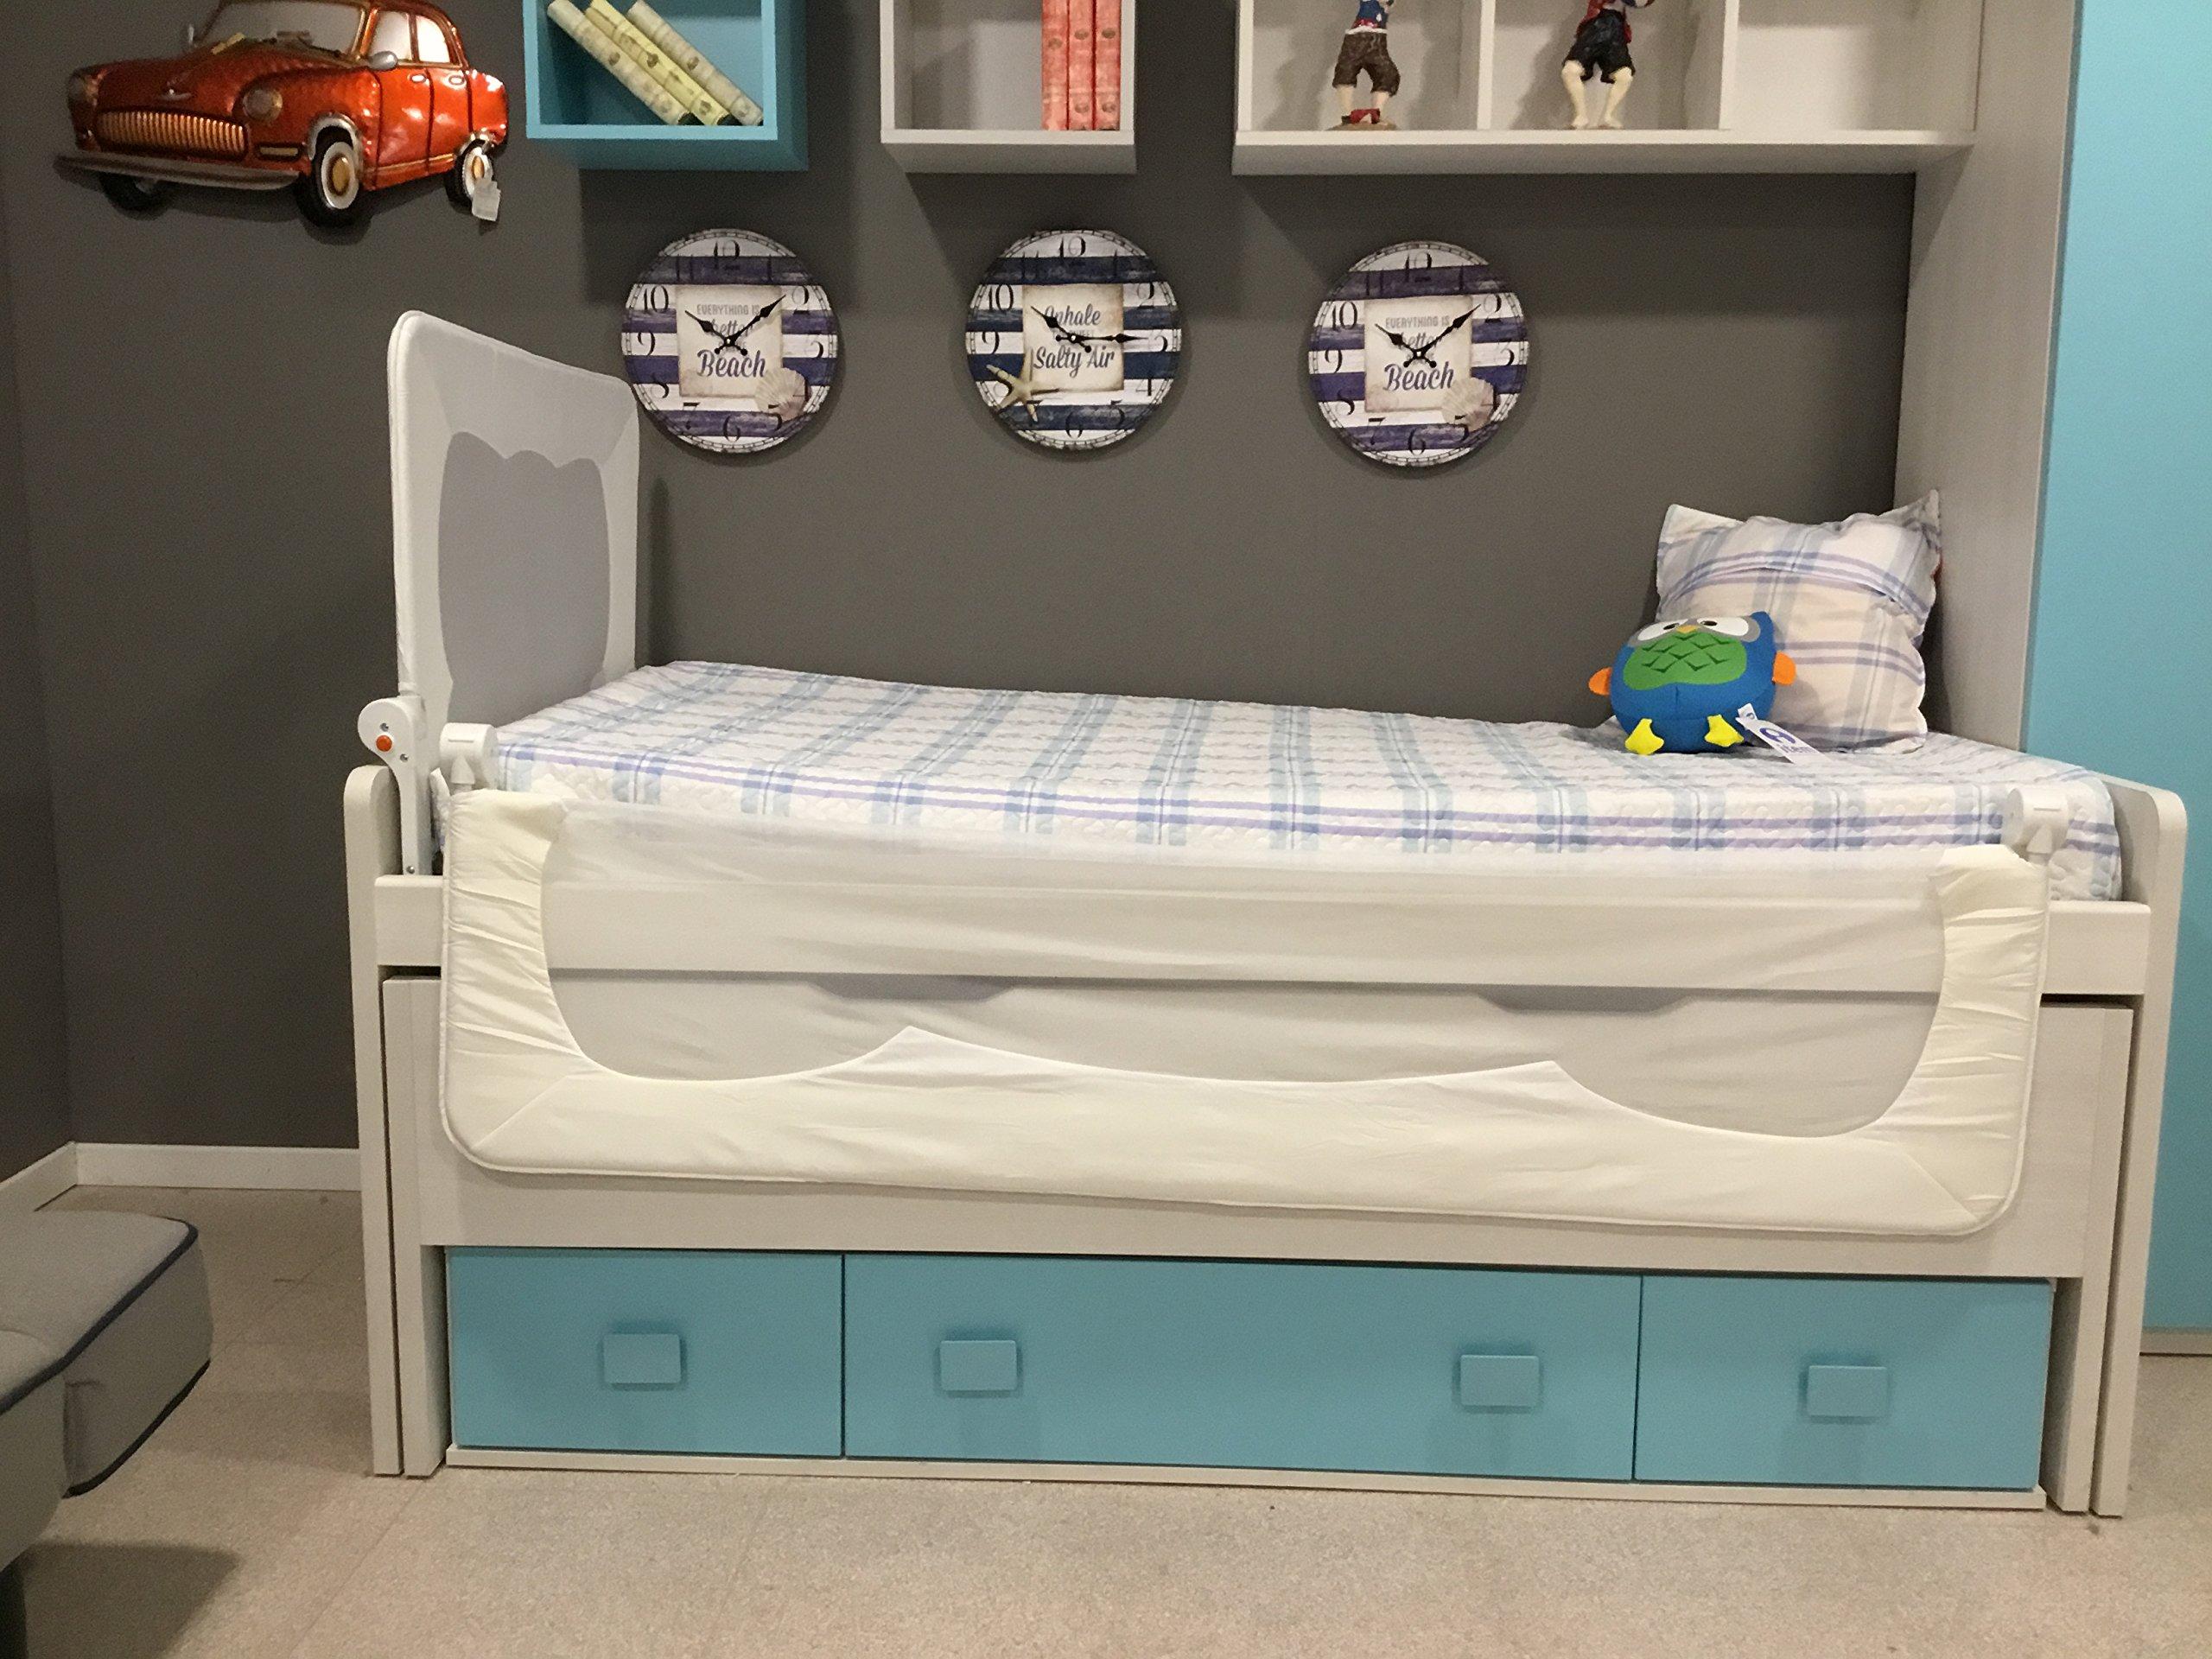 Barrera de cama para bebé, 90 x 66 cm. Modelo Blanco.Valido para